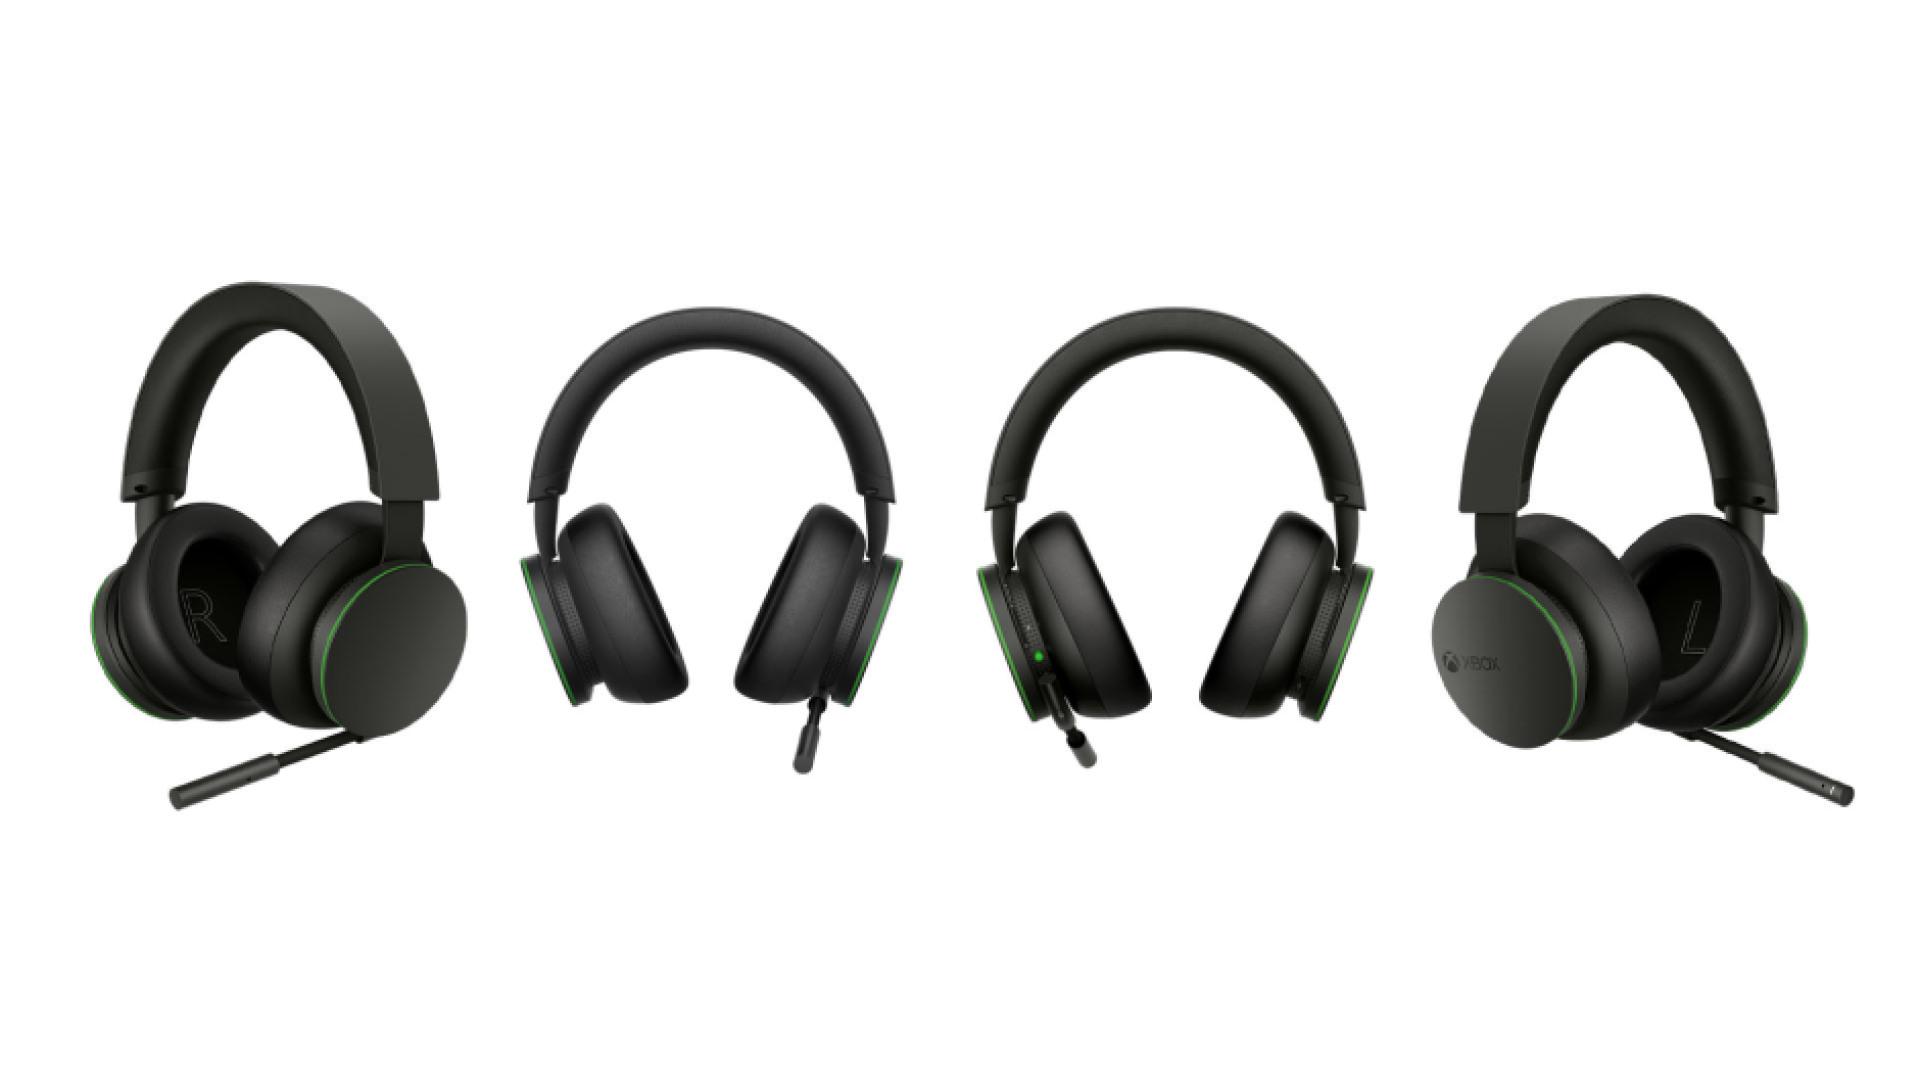 New Xbox Wireless Headset - Game Audio/Mic Issues on PC via Bluetooth XboxWire_WirelessHeadset_RendersAsset.jpg